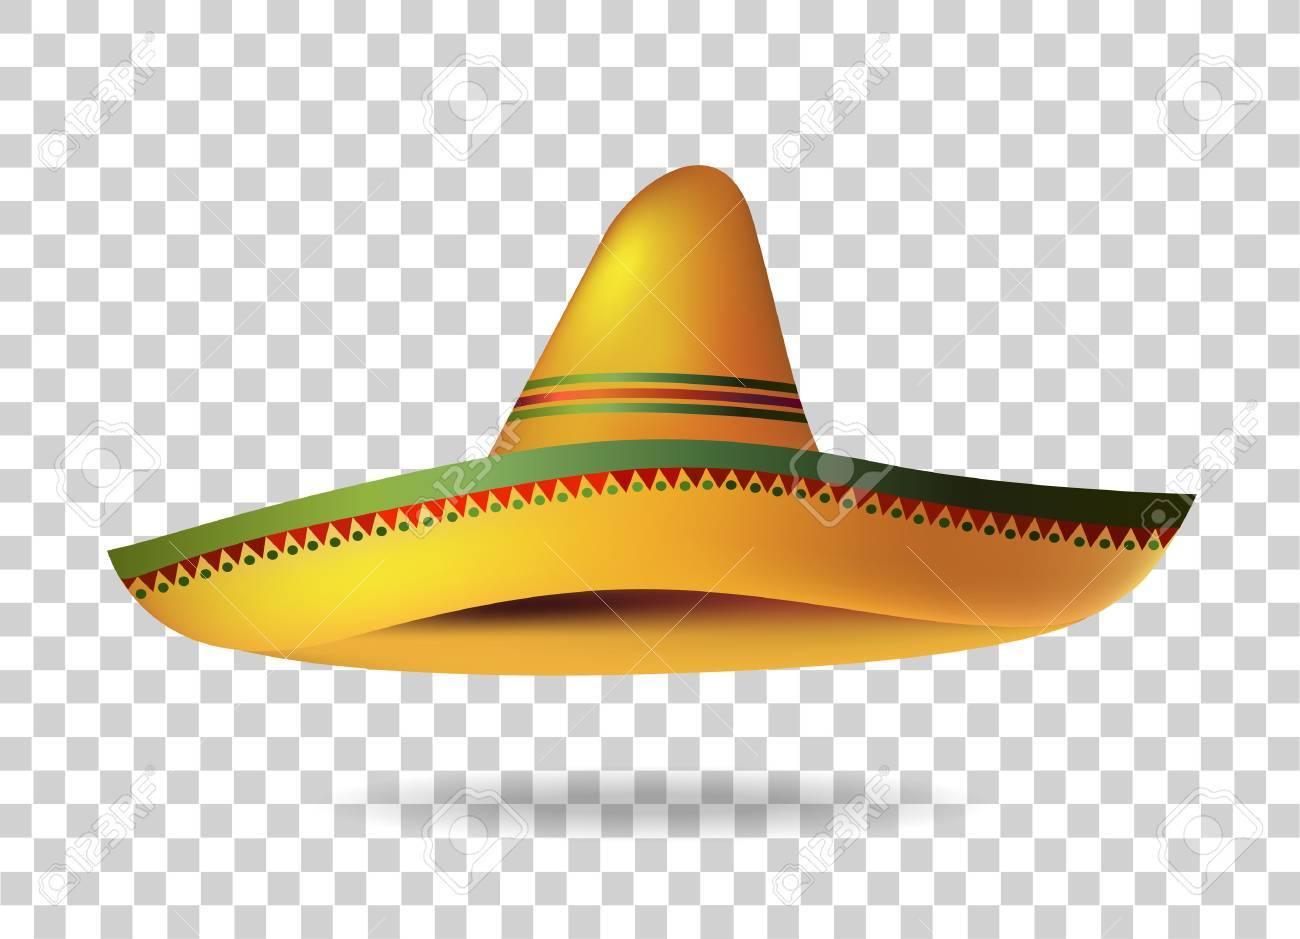 Mexican Sombrero Hat transparent background. Mexico. Vector illustration  Stock Vector - 69983261 e03f11b0cc9